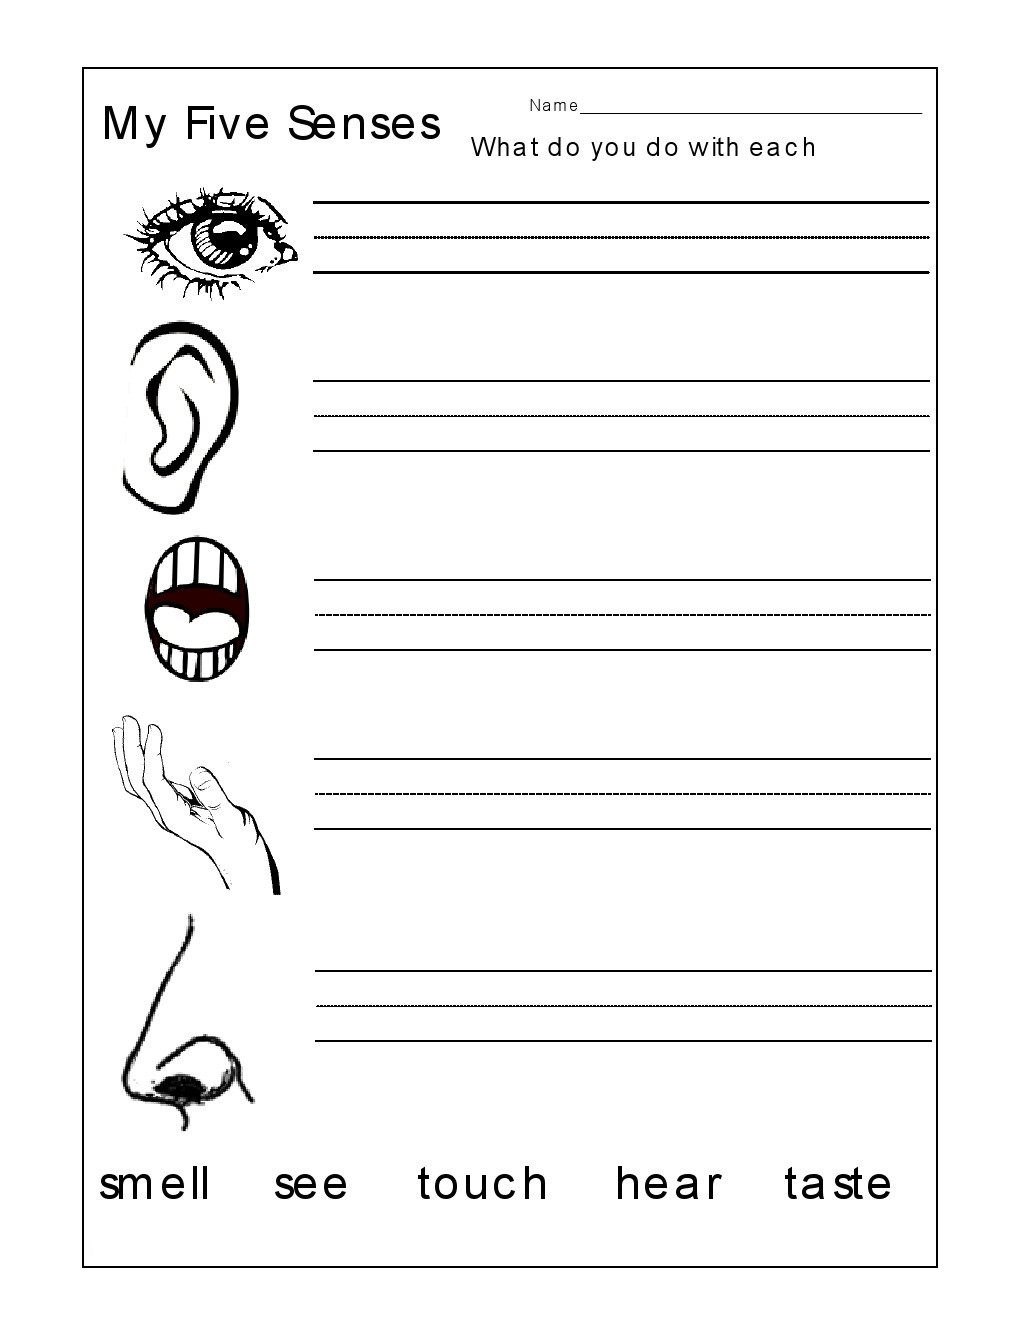 5 Senses Worksheets for Kindergarten Kindergarten Worksheets Kindergarten Worksheets the 5